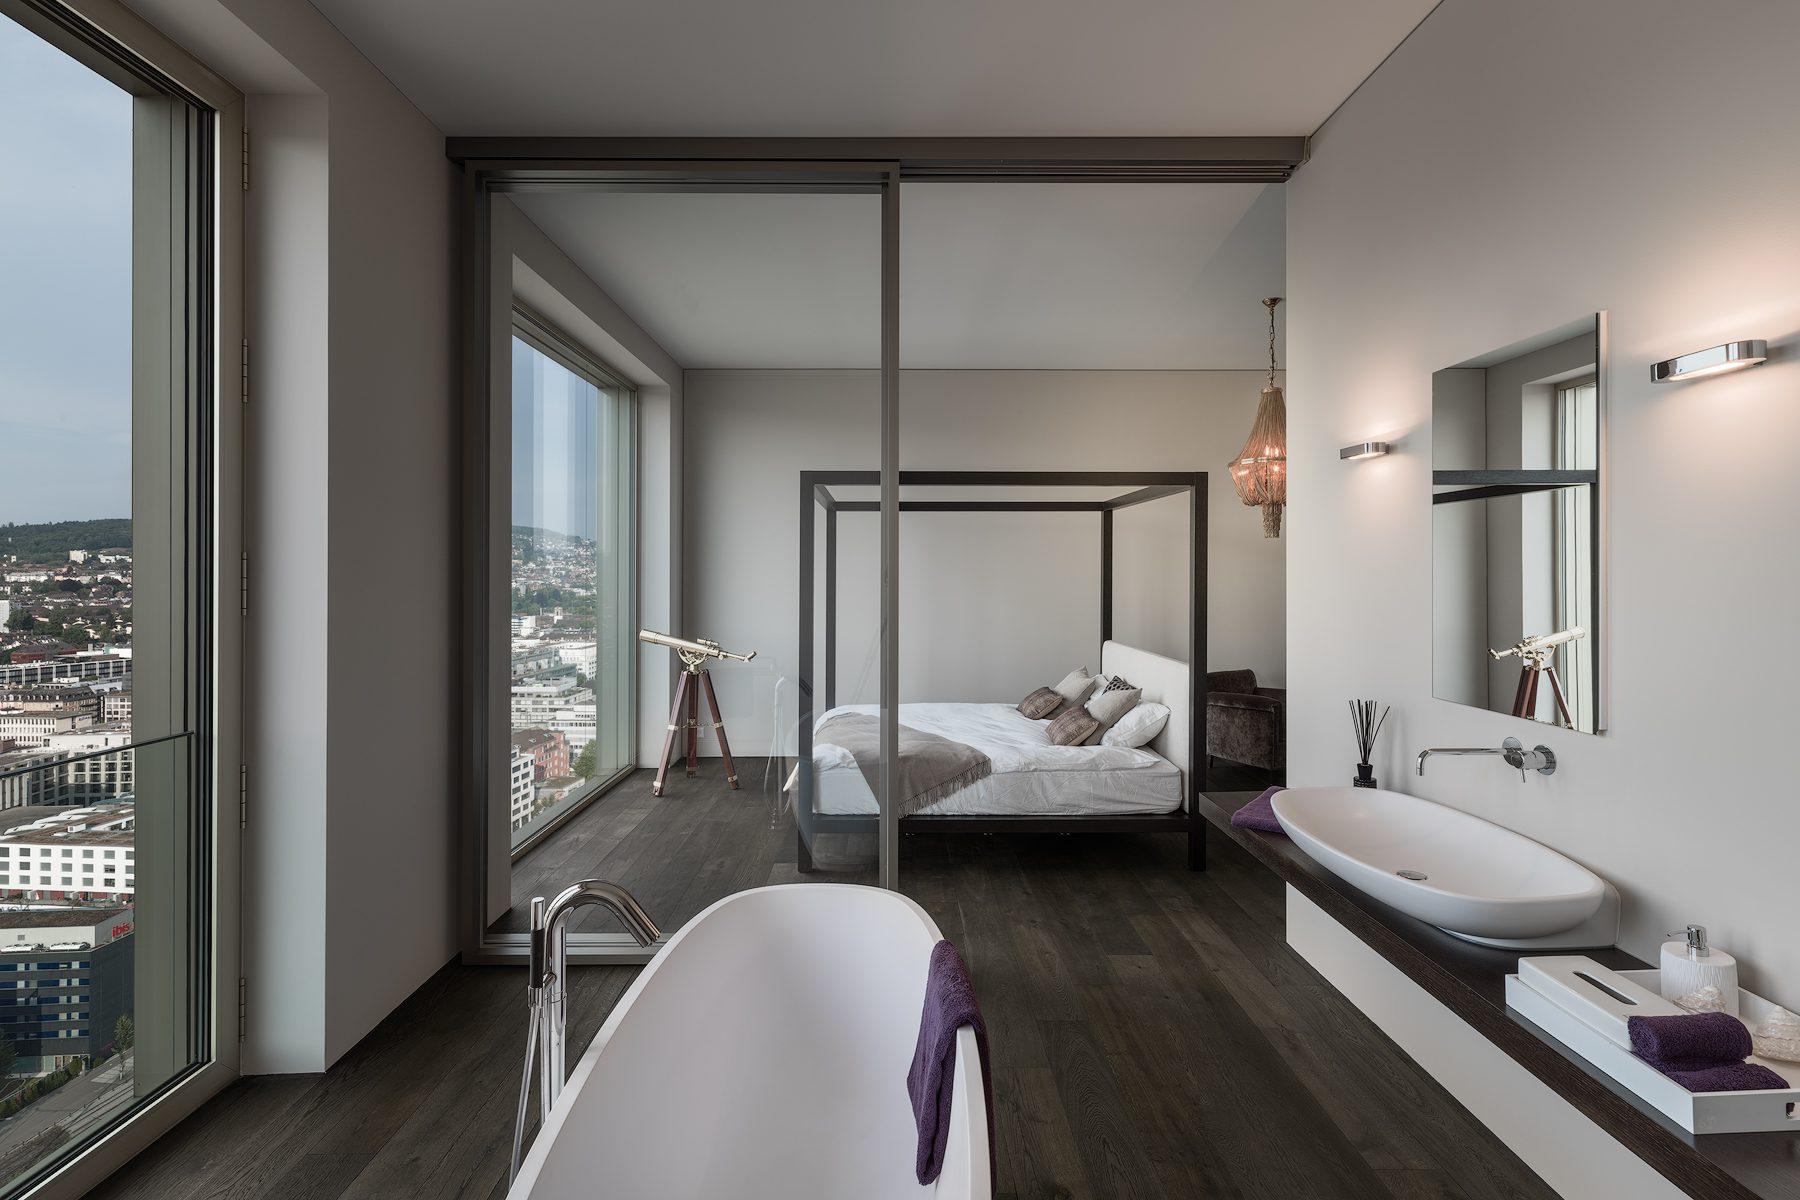 Interiorfotografie / Master Bedroom / Penthouse / Mobimo Tower / Zürich